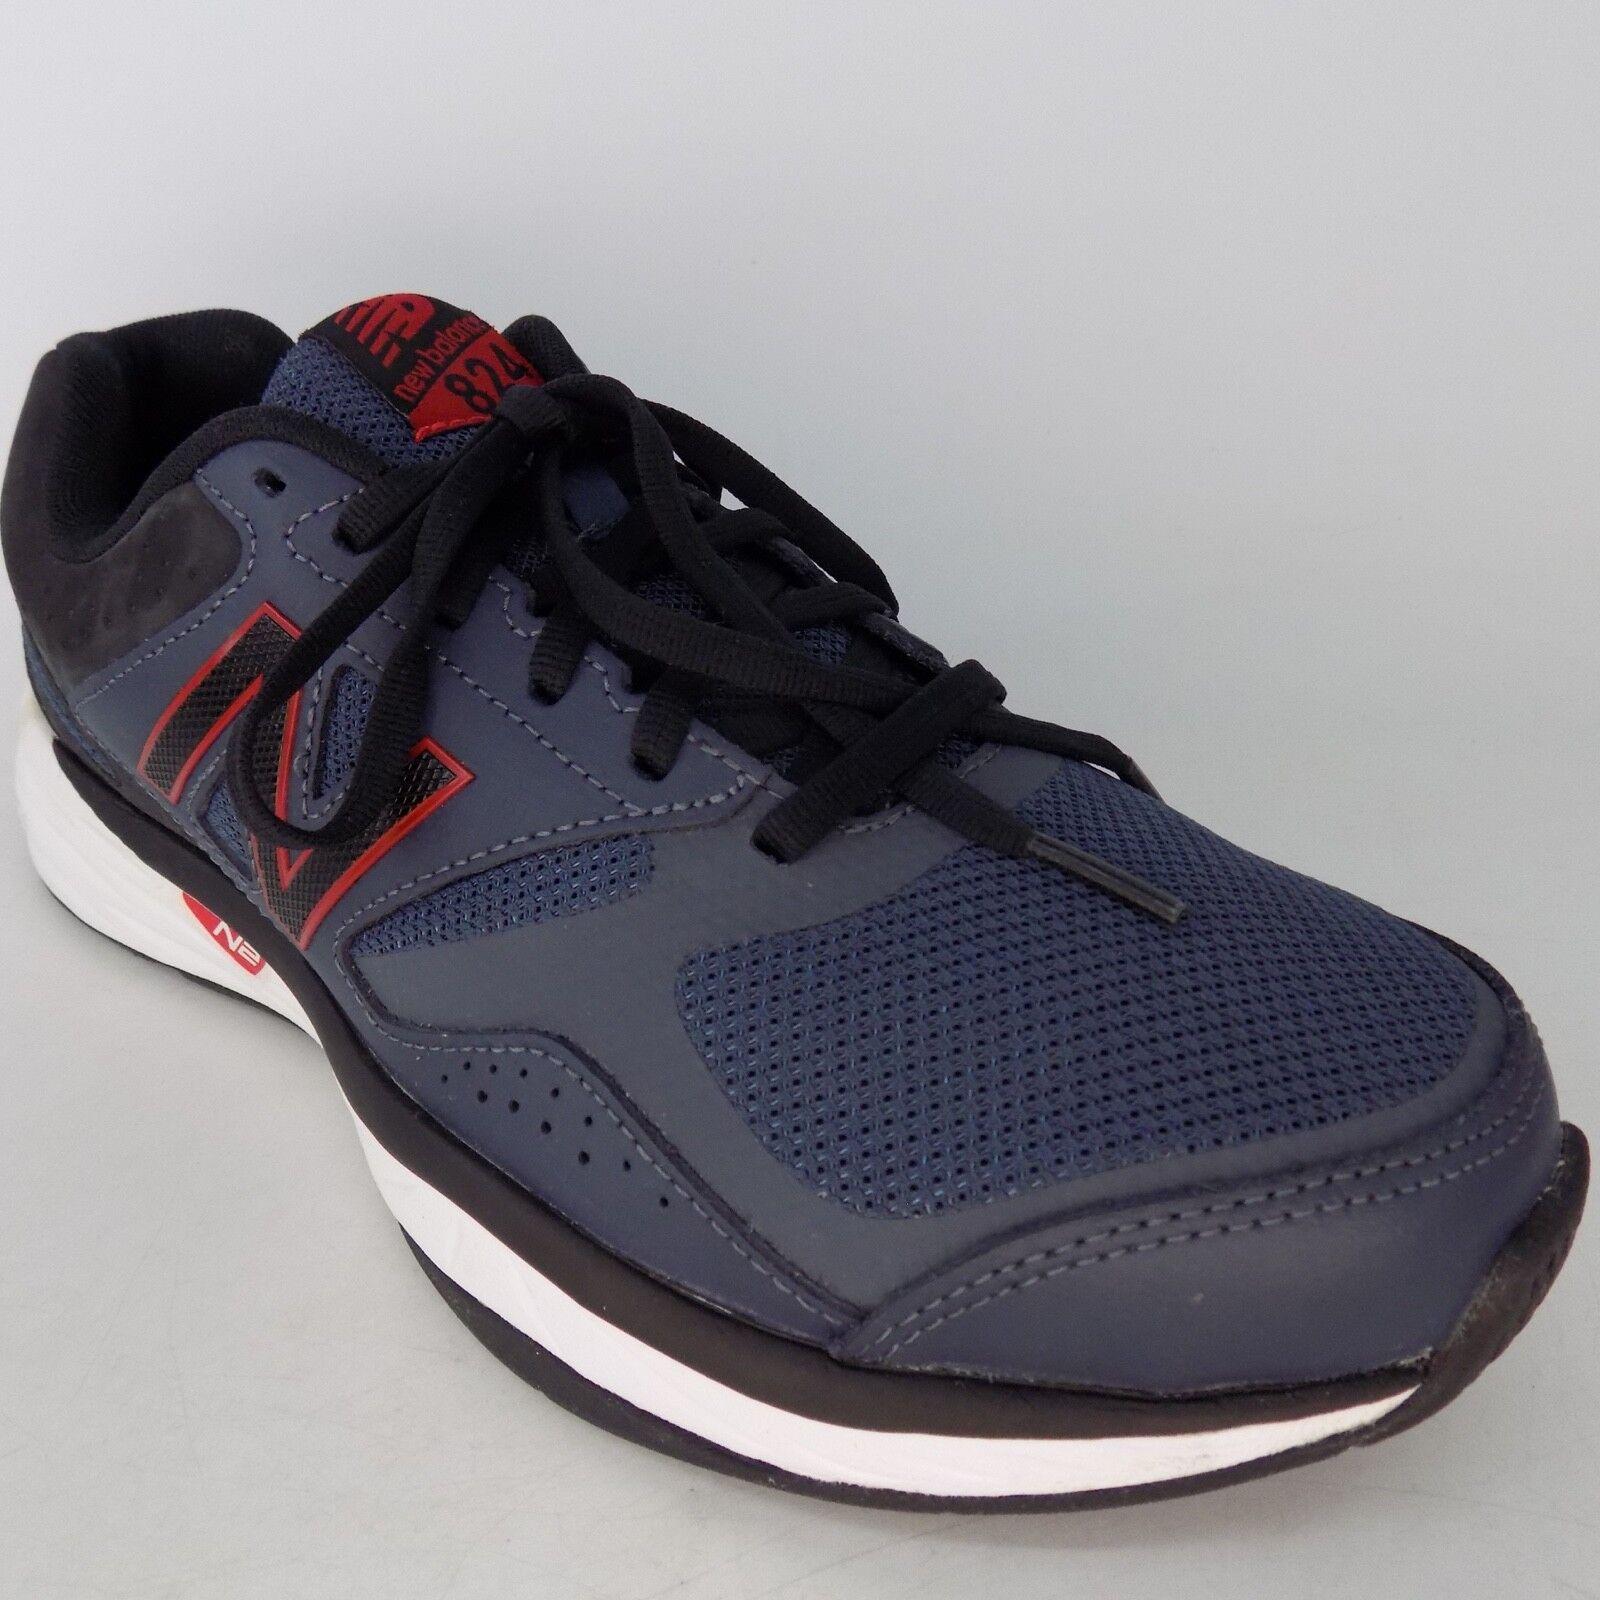 New Balance Mx824gr1 Grey Red Running Men's shoes Size 8.5 (2E) EU 42 AL5025